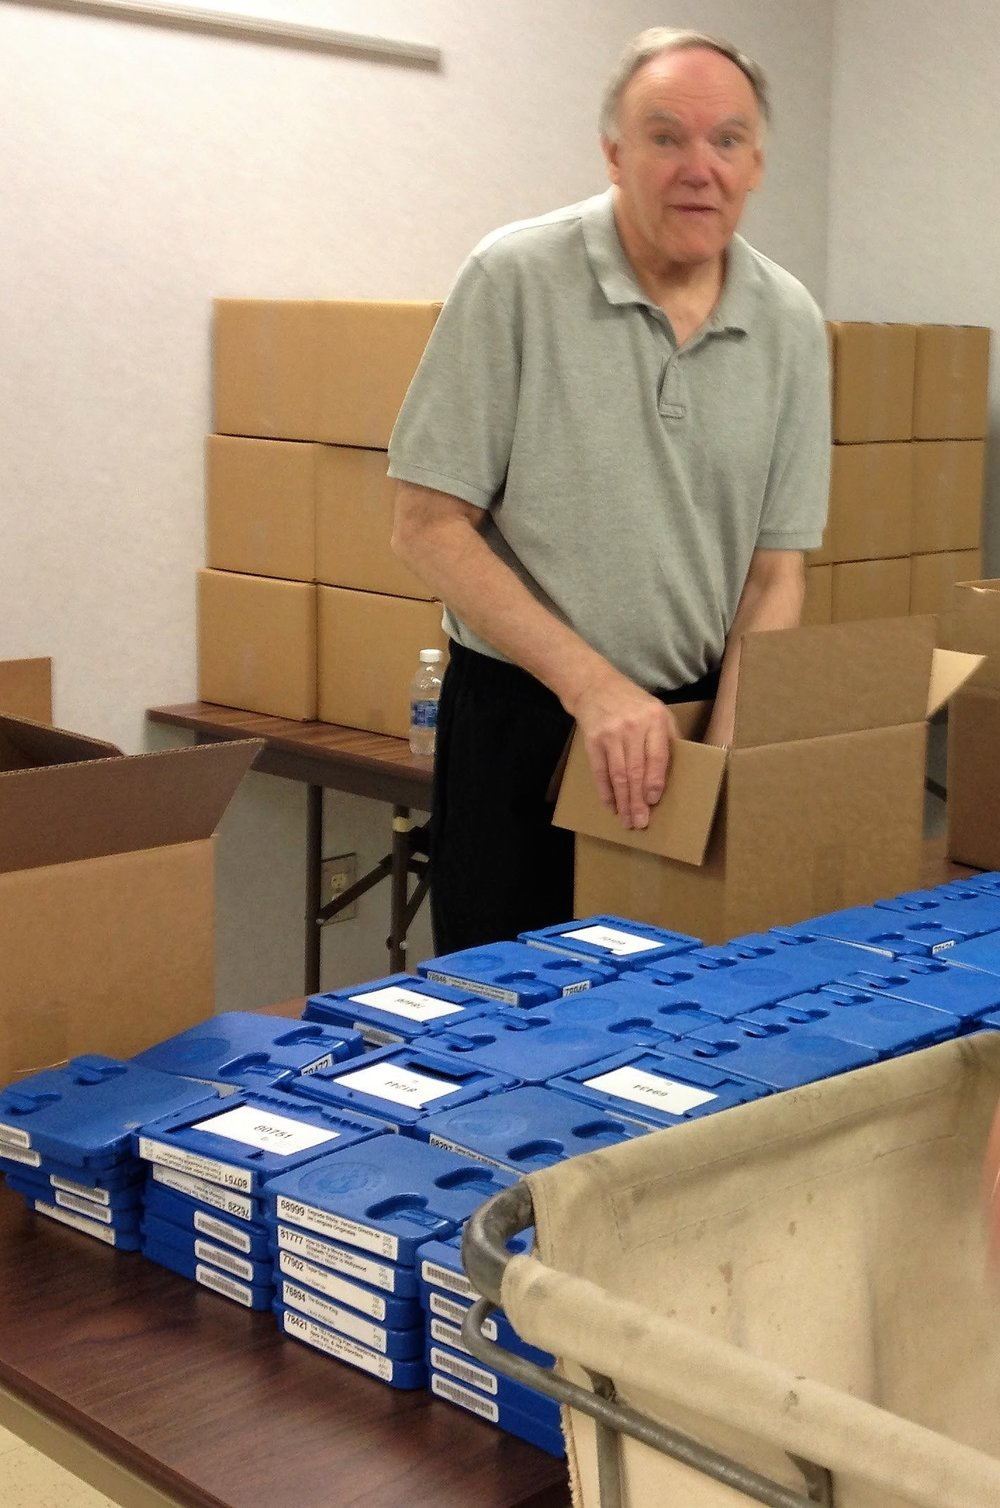 Jim Rechkemmer, Master Volunteer Partner